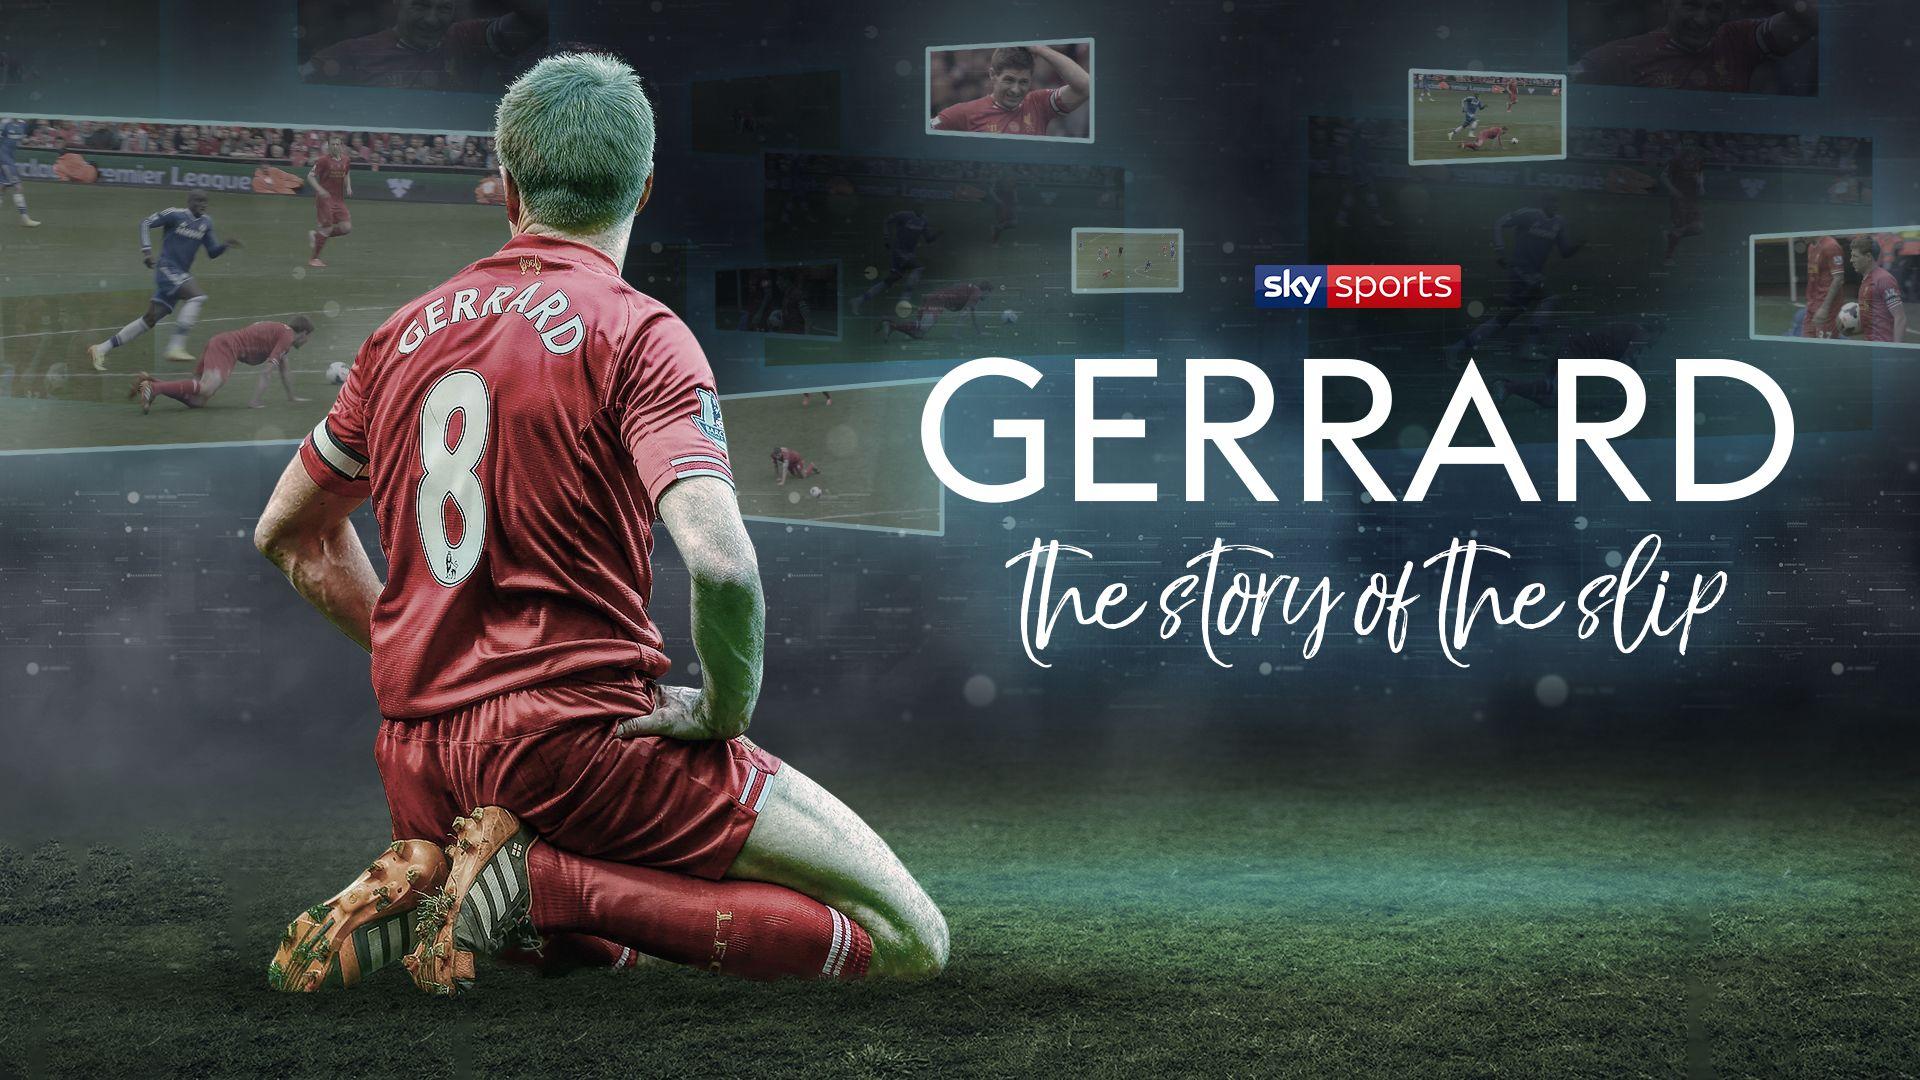 Gerrard man of the match betting usa mirandes vs deportivo la coruna betting preview